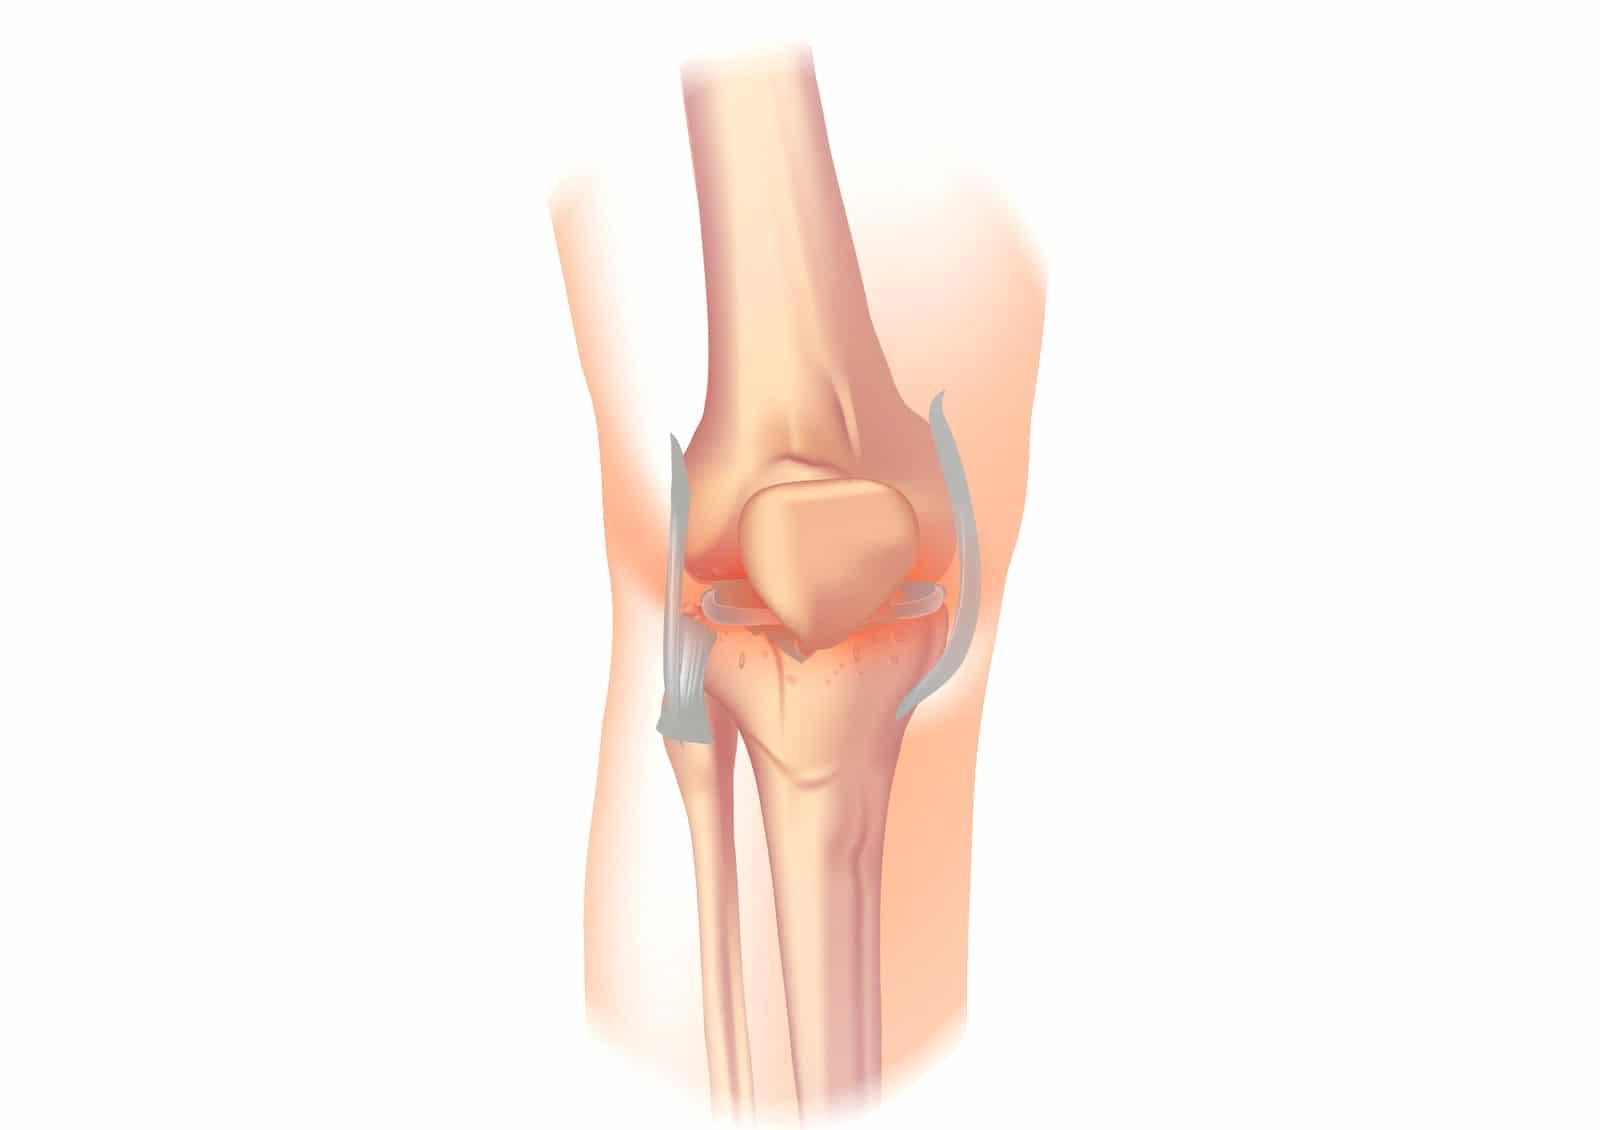 Artróza kolena